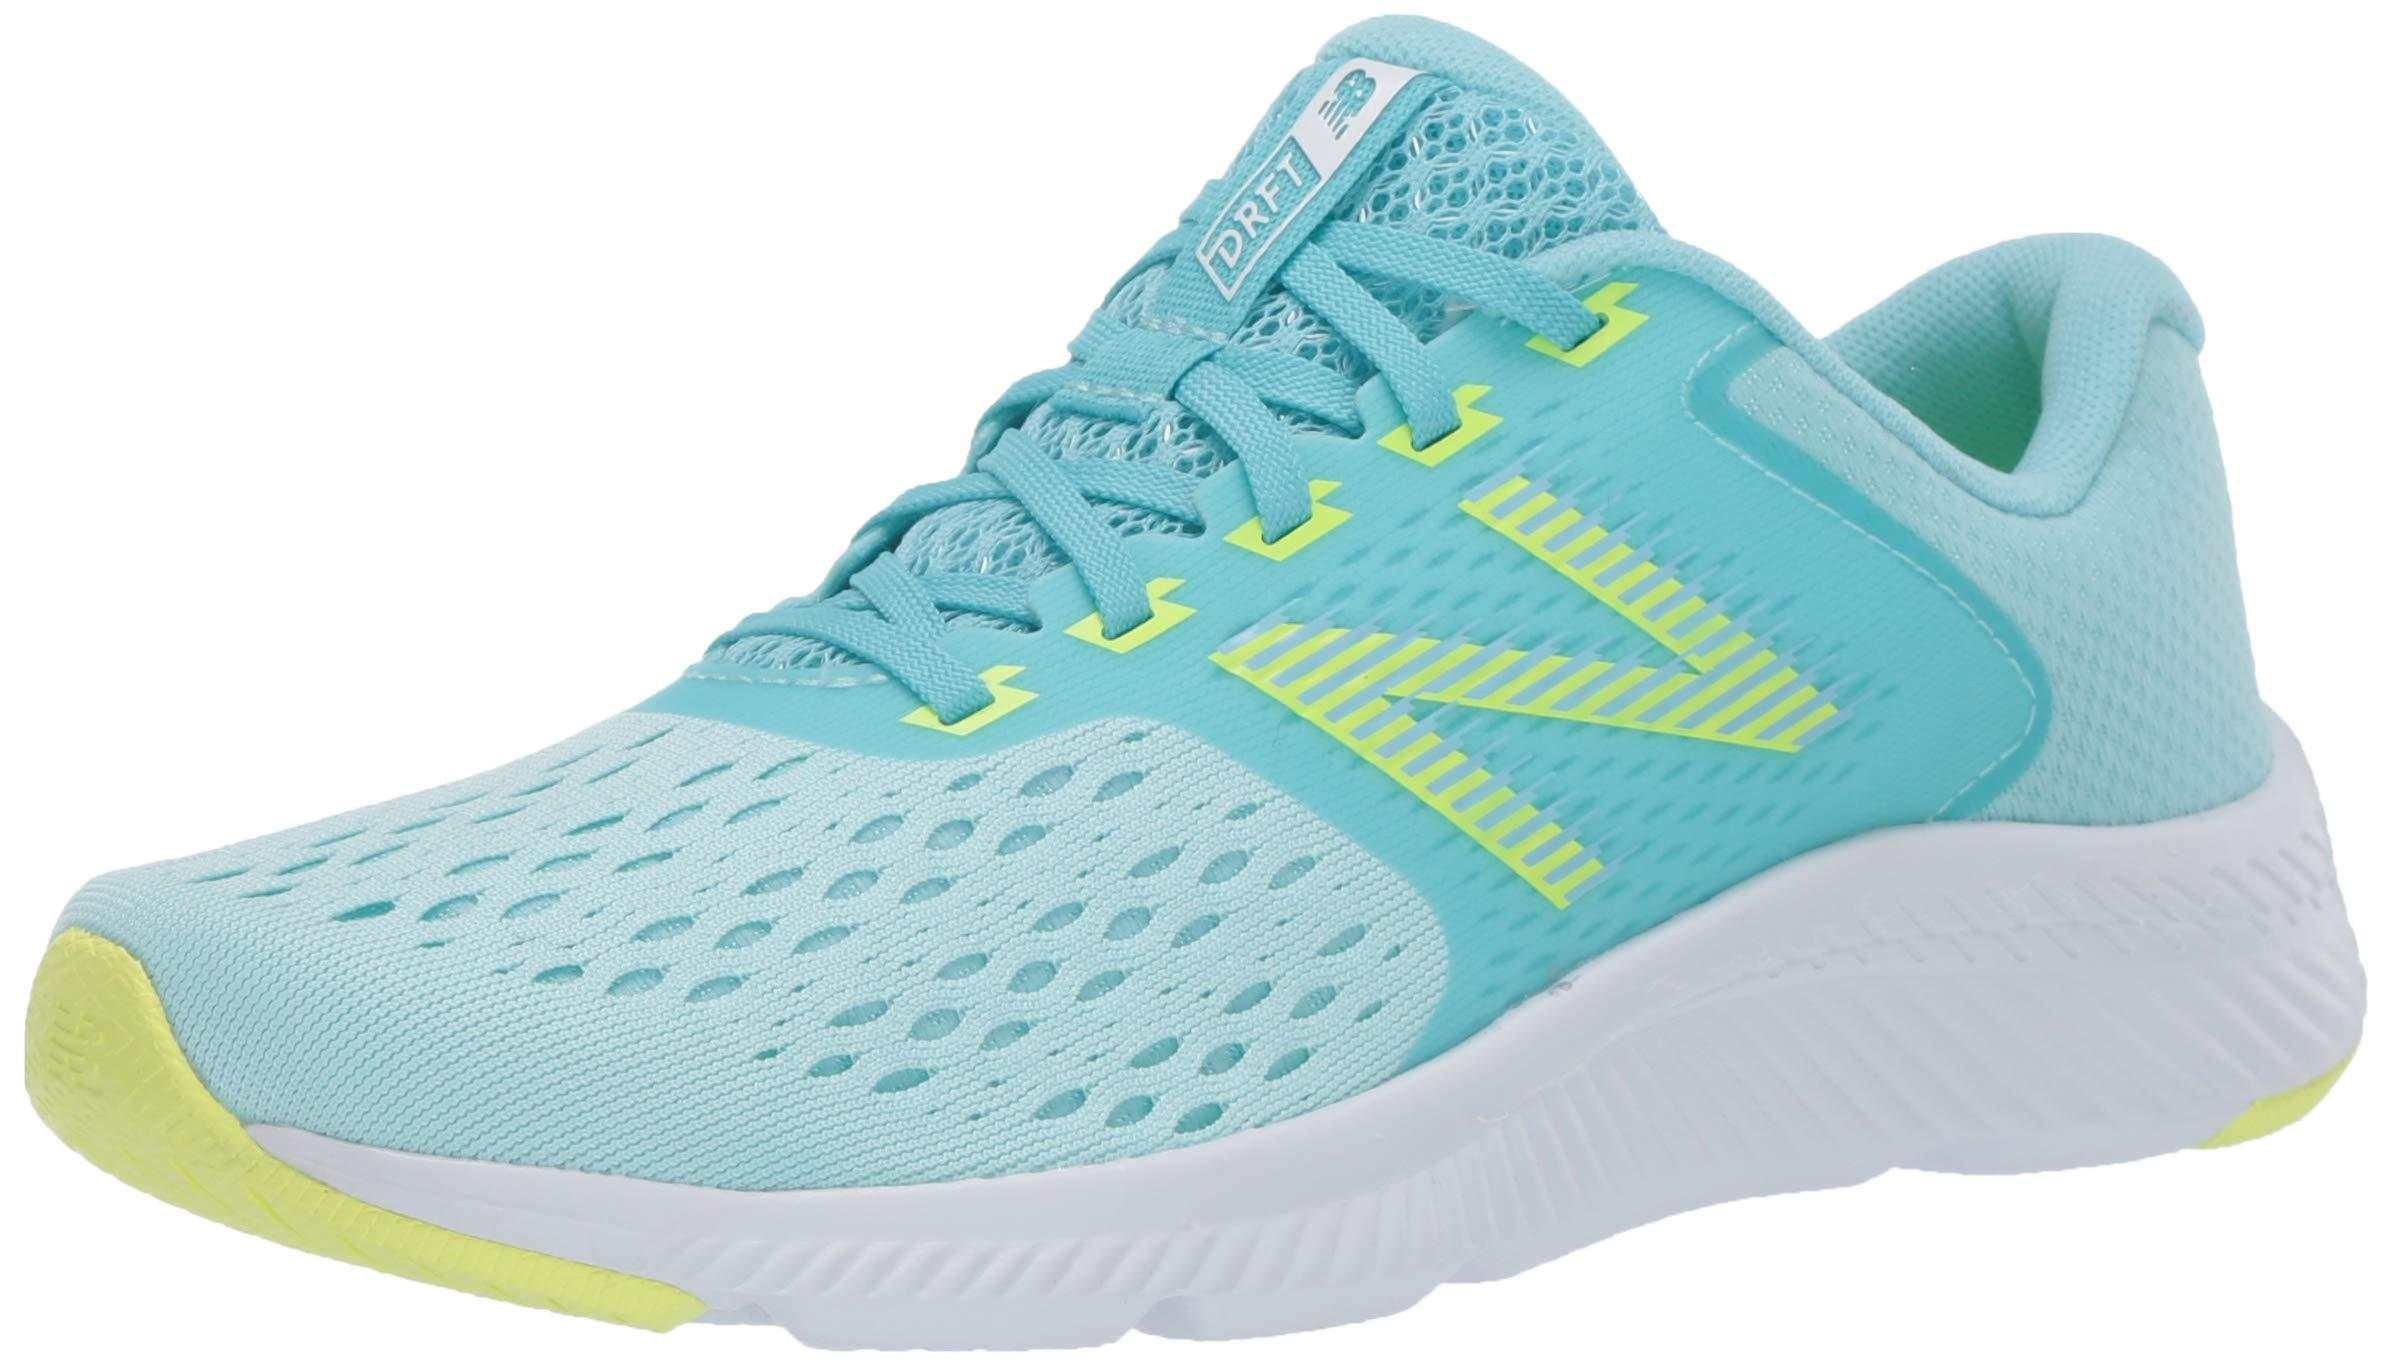 New Balance Synthetic Drft V1 Running Shoe in Blue/Green (Blue ...